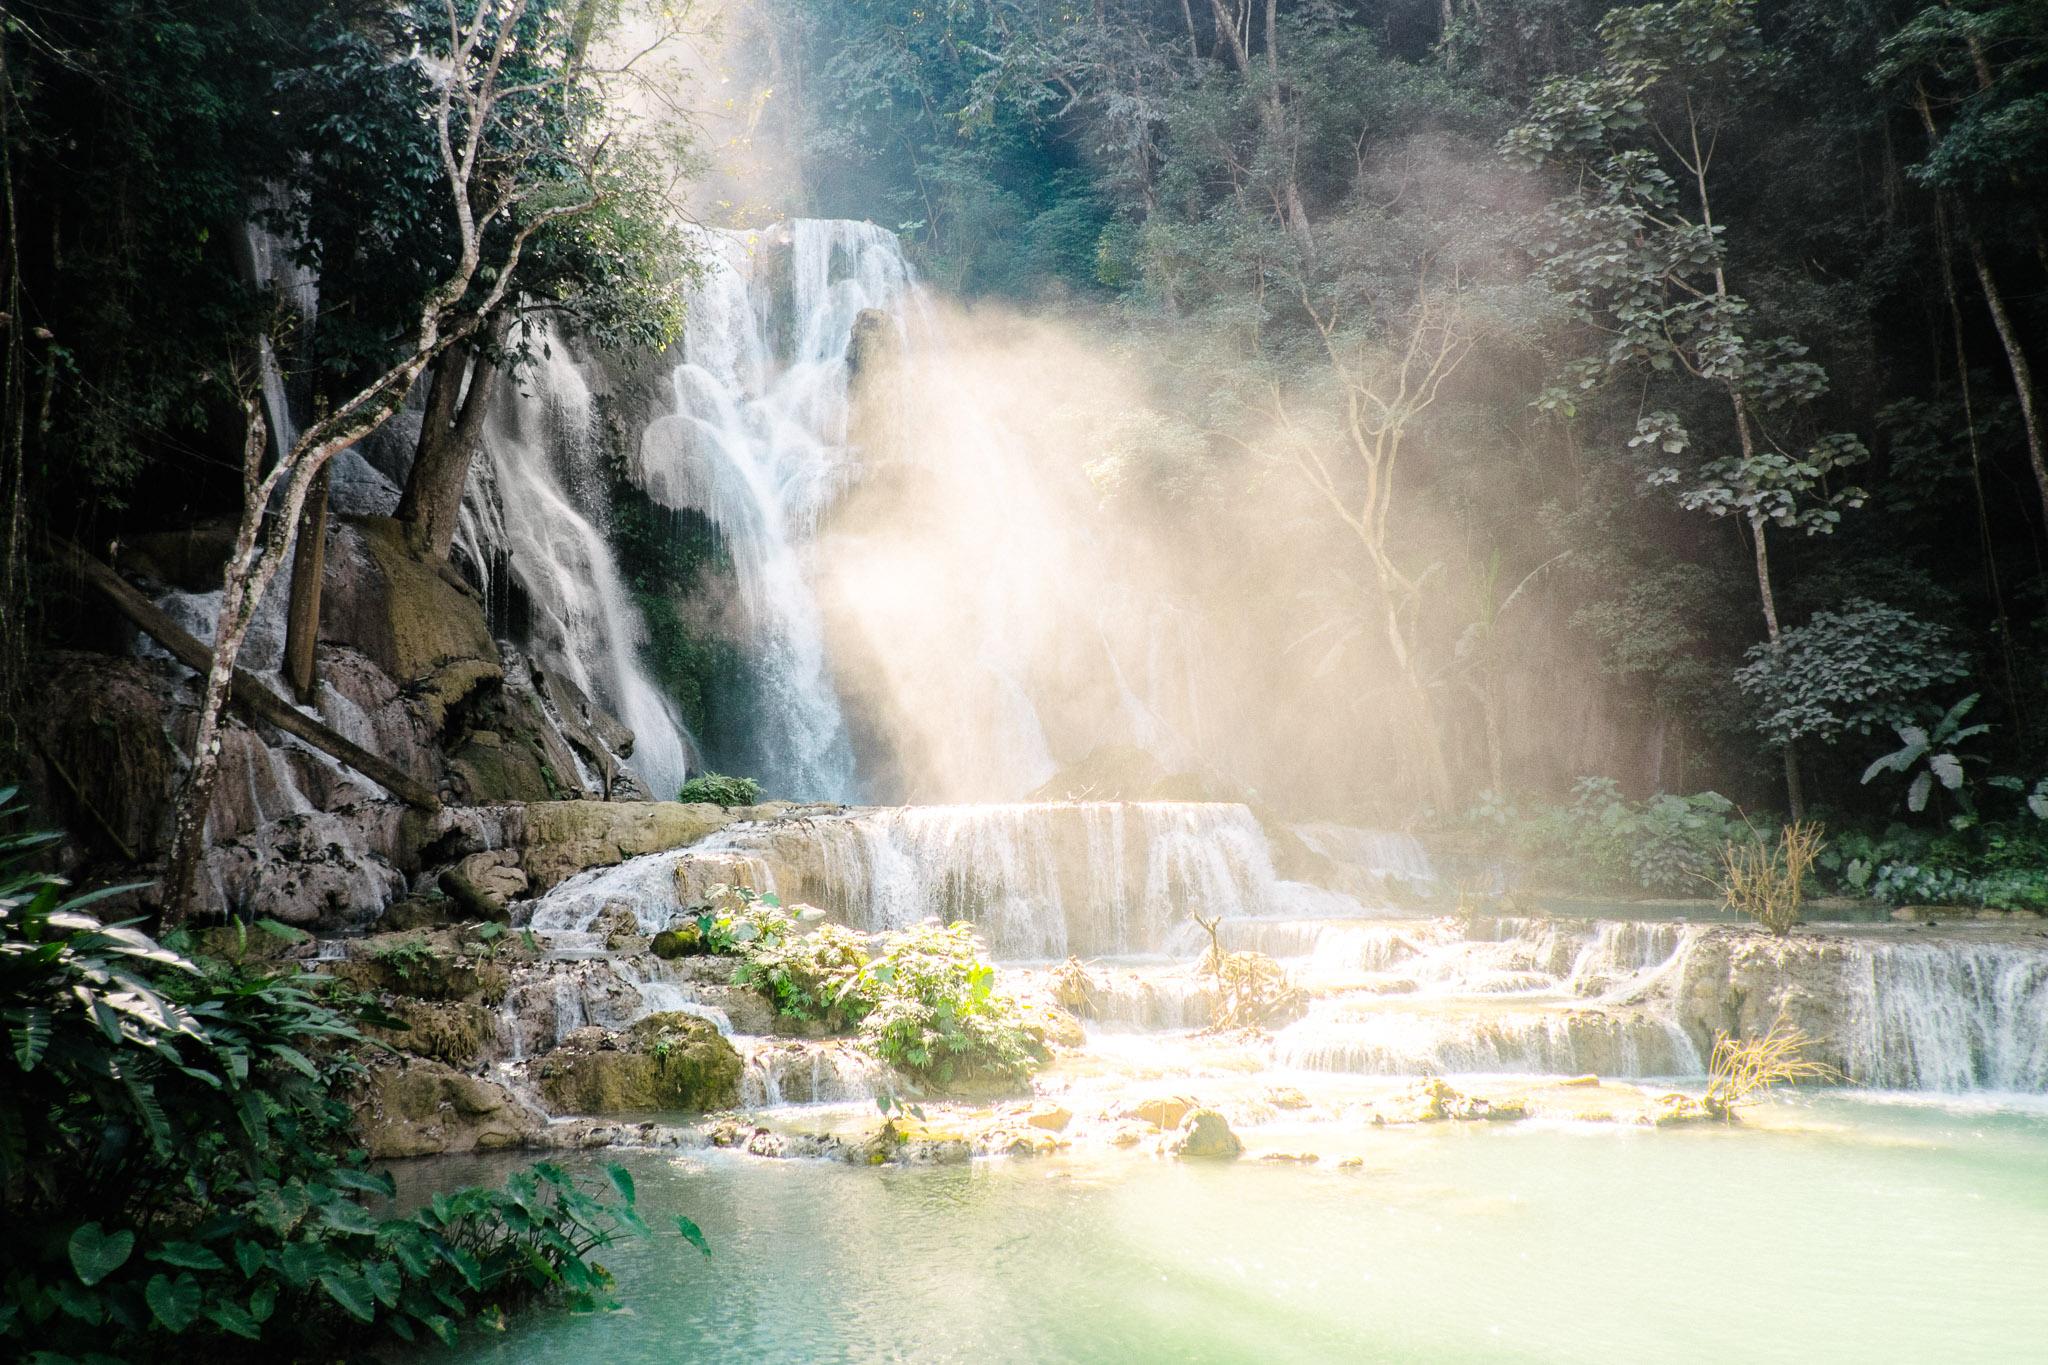 laos-luang-prabang-kuang-si-falls-1.jpg